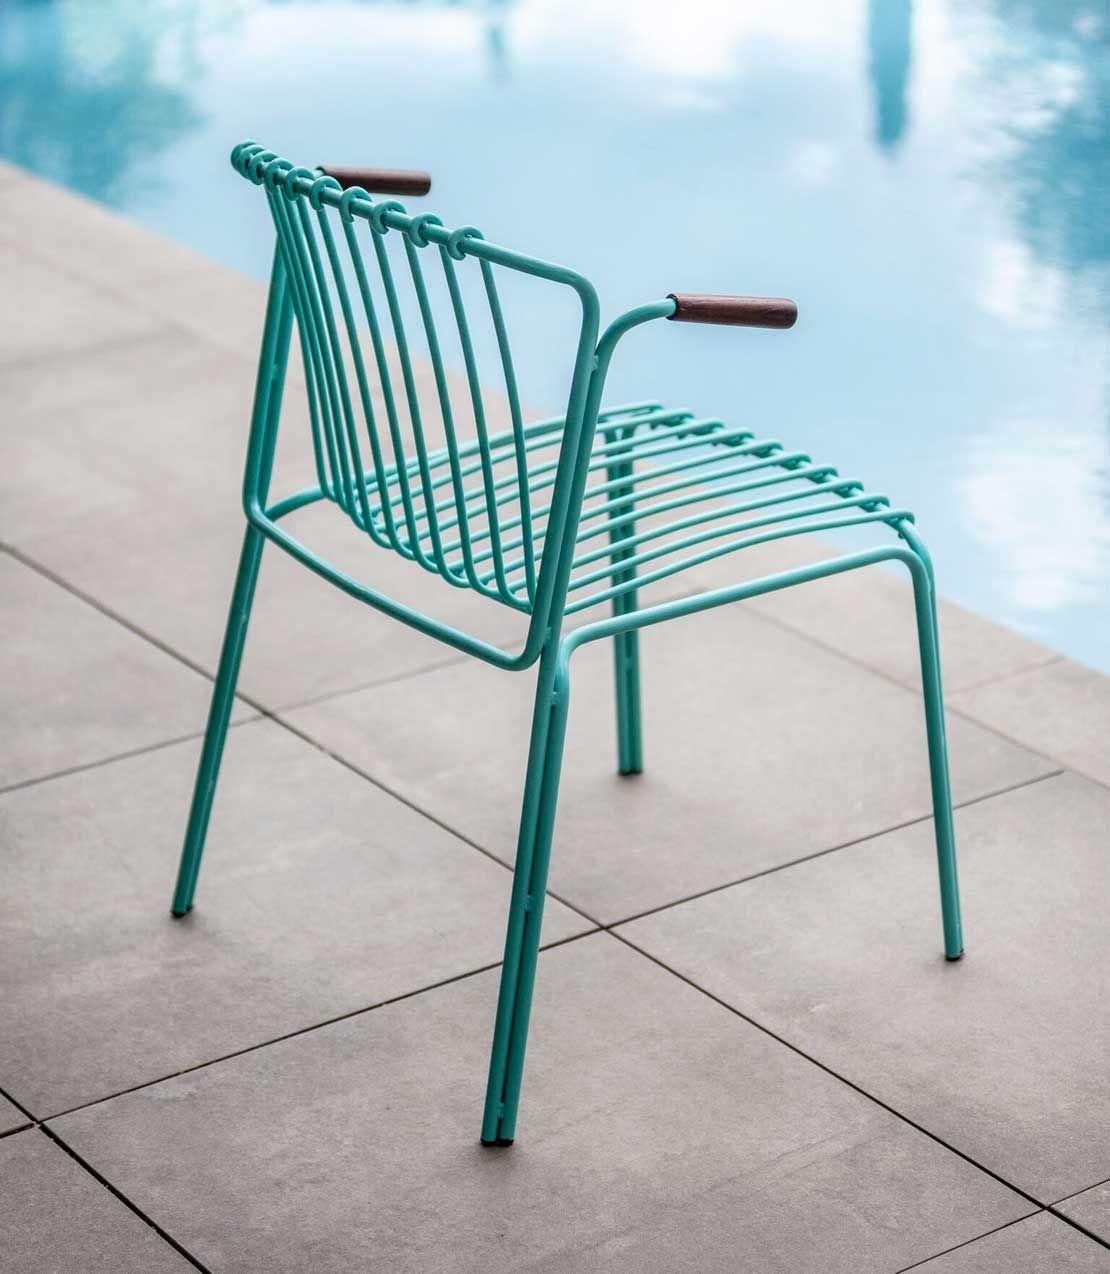 Welzel Sessel Stuhle Sessel Stuhle Hochwertige Mobel